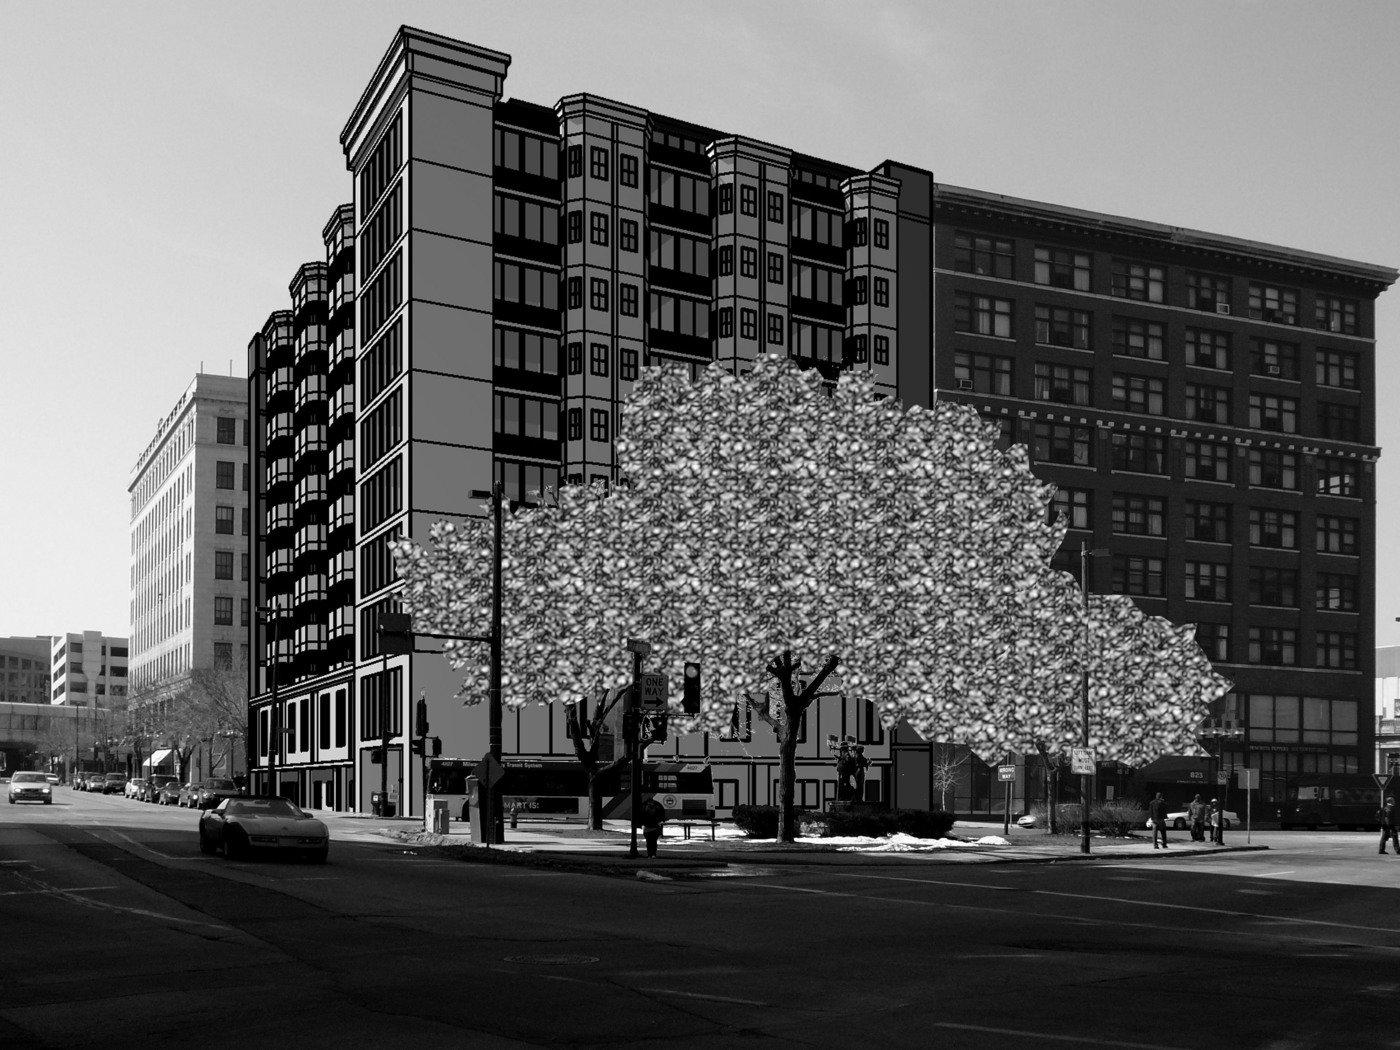 Urban Hotel By Scott Klopfer At Coroflot Com